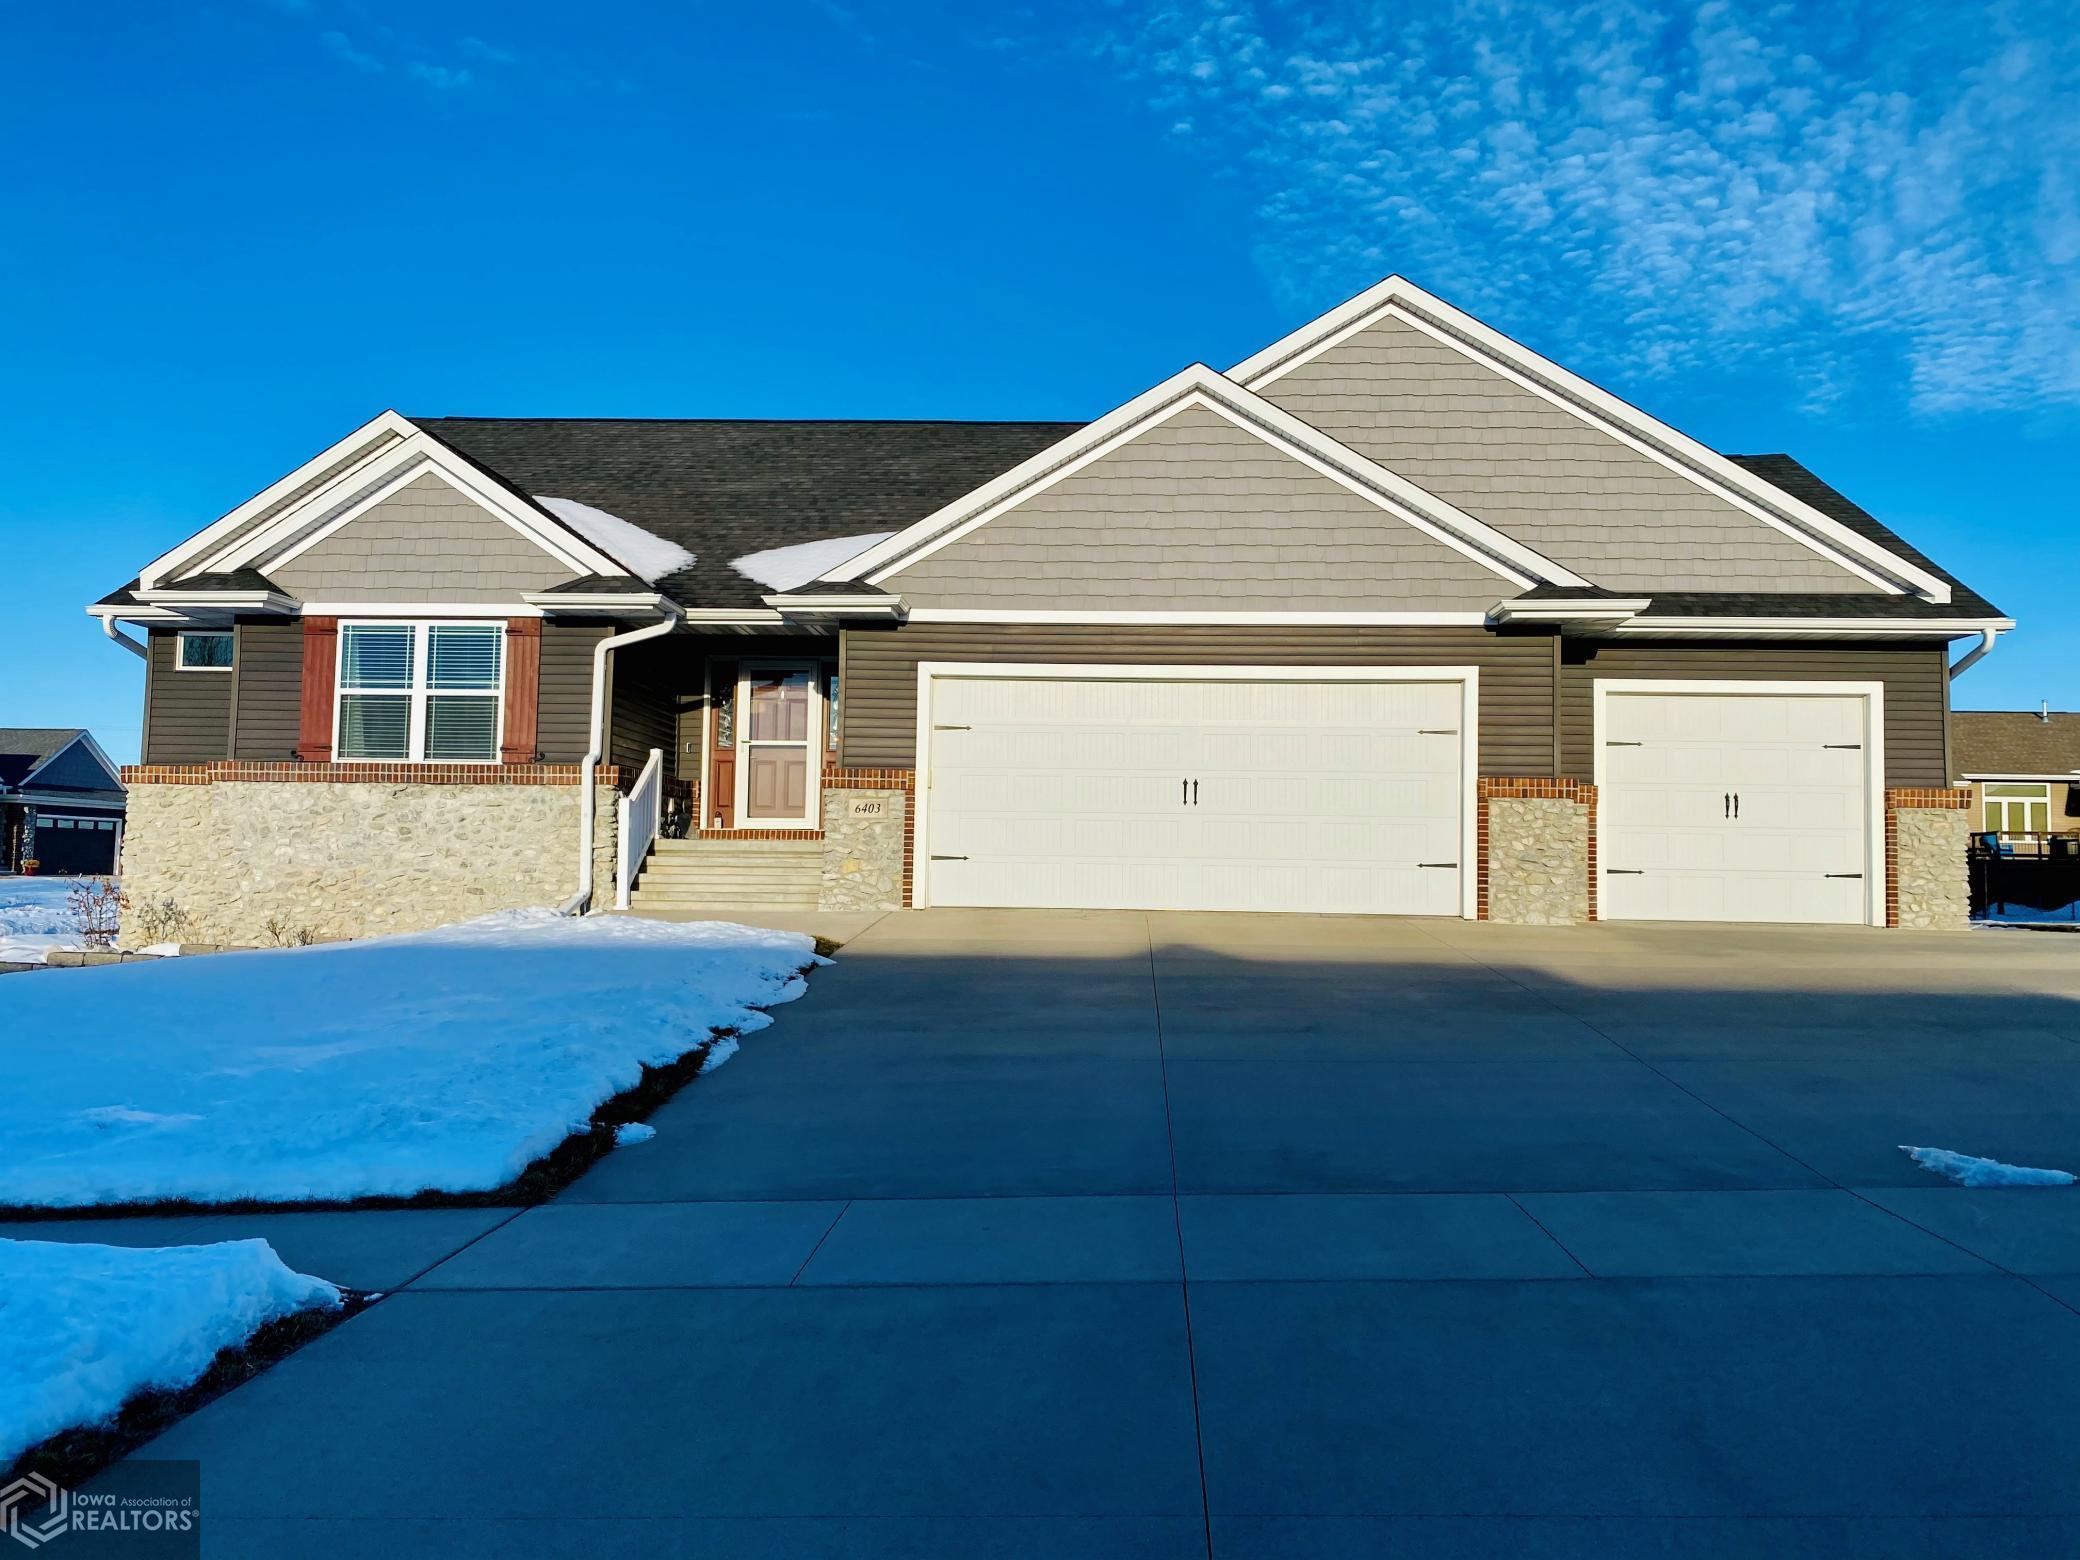 6403 Grant, Cedar Rapids, Iowa 52404-7480, 4 Bedrooms Bedrooms, ,3 BathroomsBathrooms,Single Family,For Sale,Grant,5703844